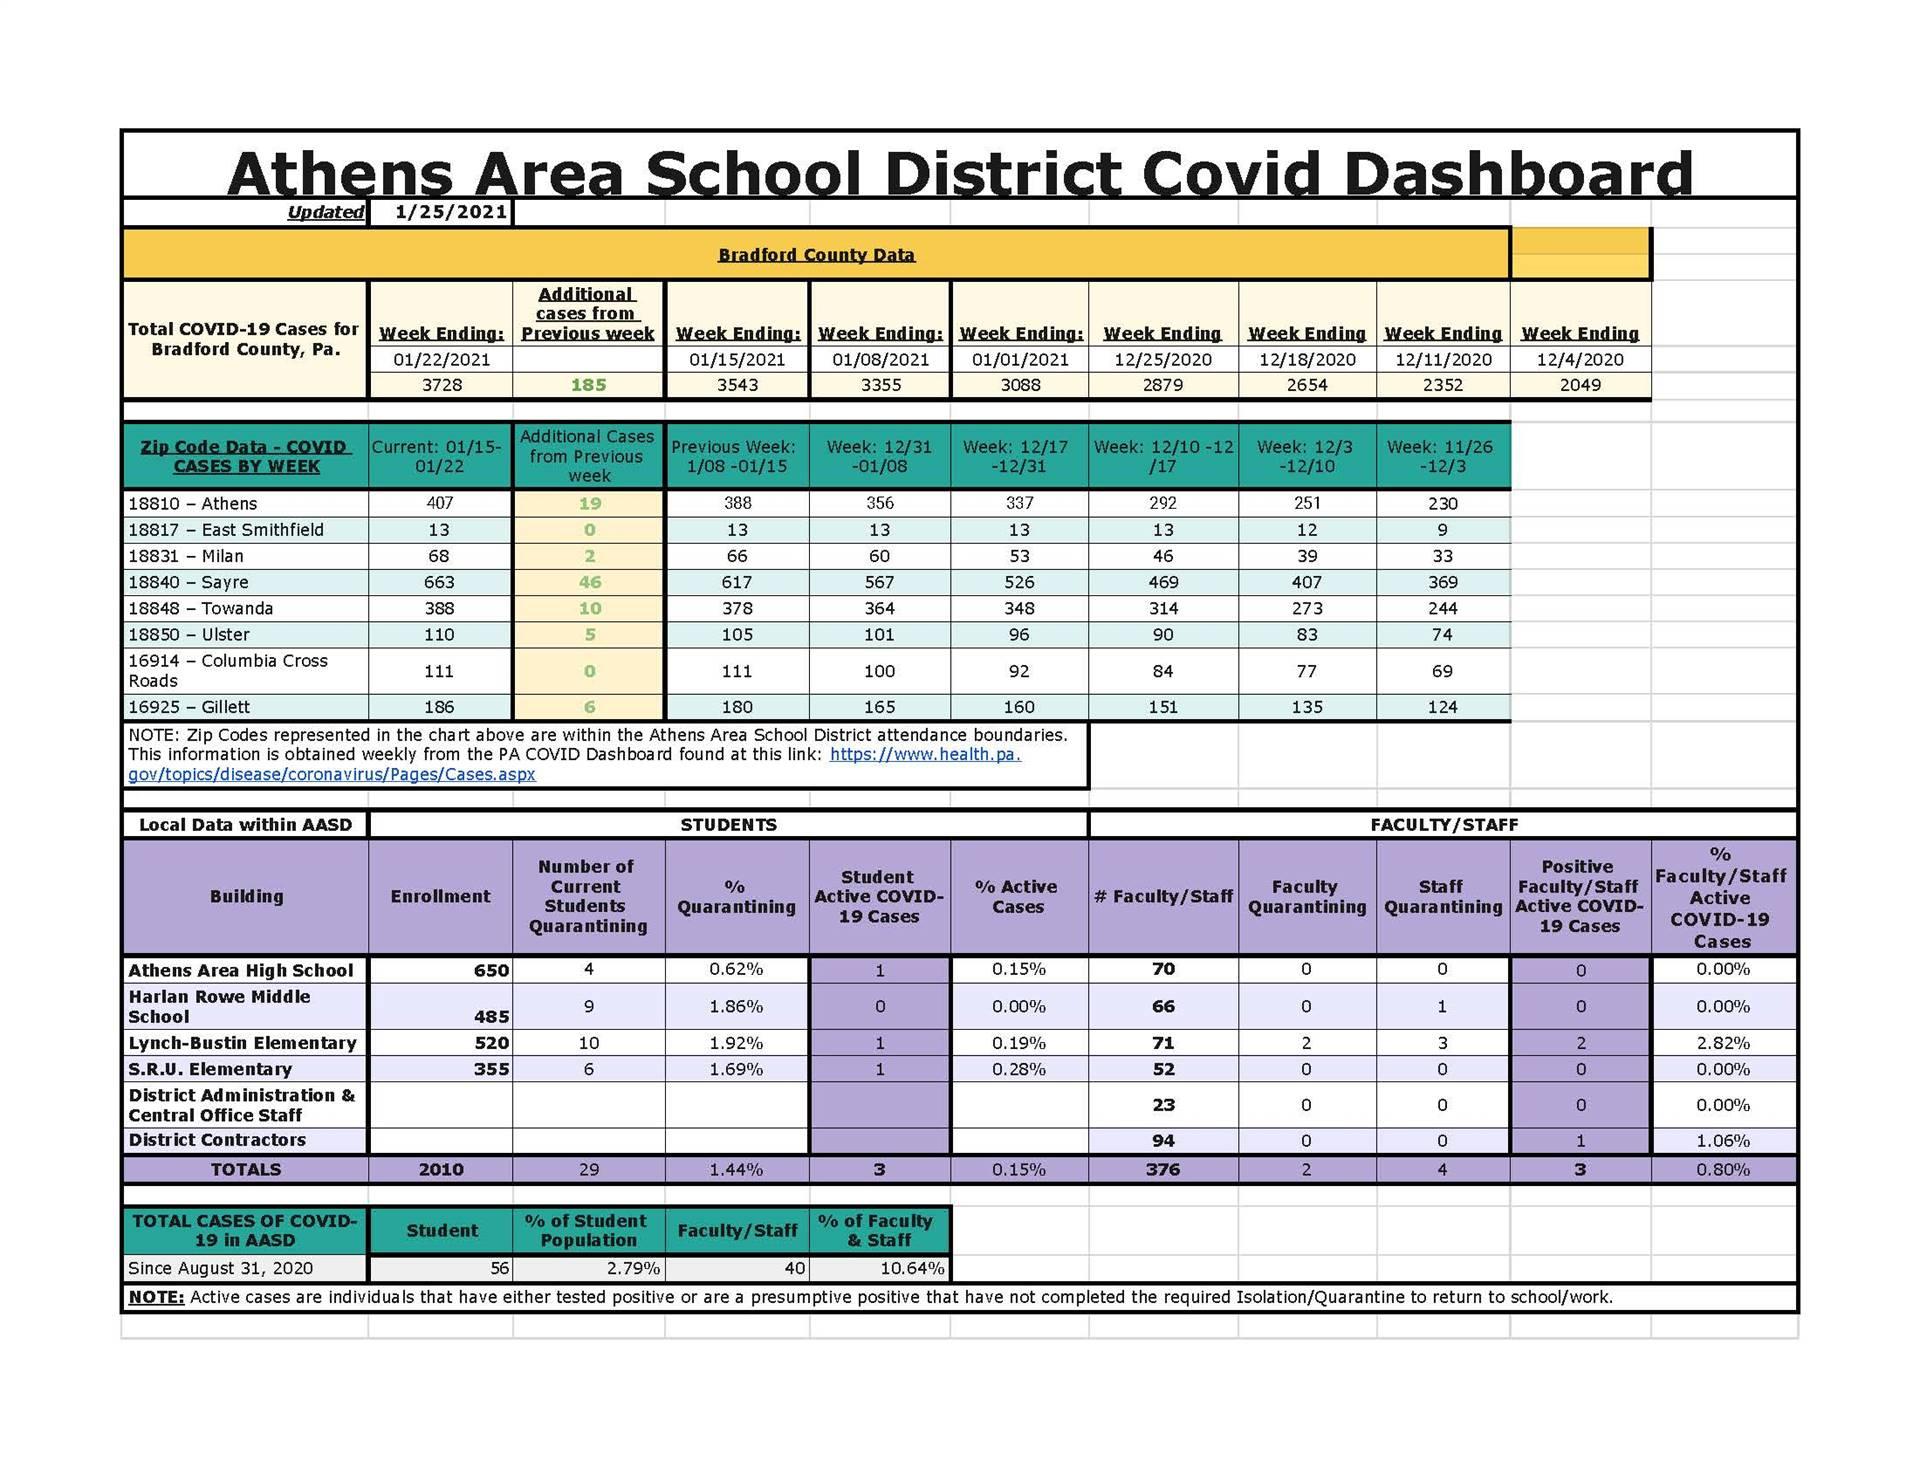 AASD COVID Dashboard 01.25.2021